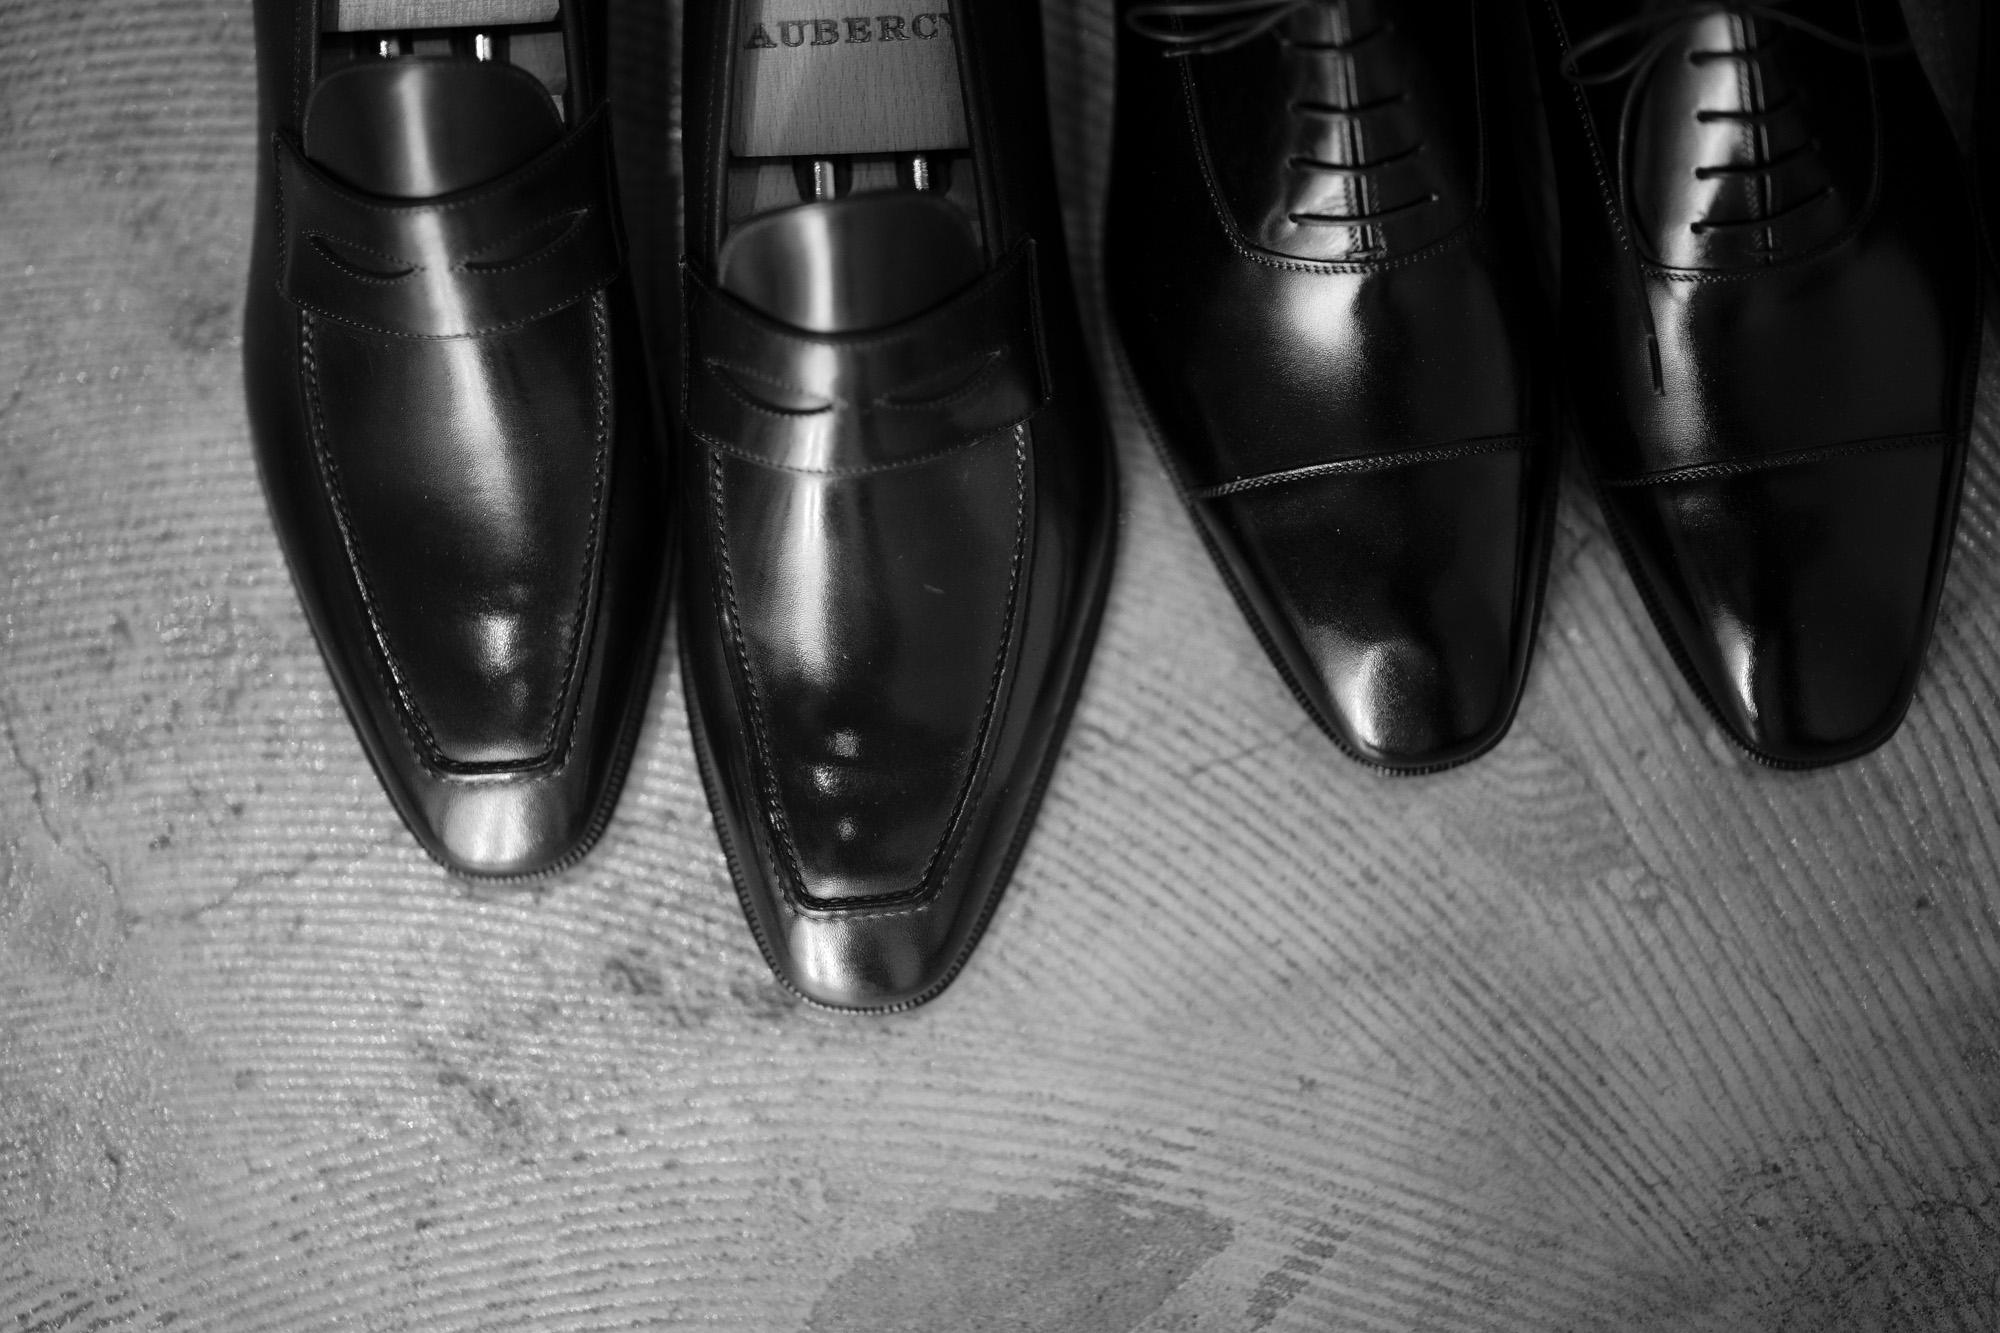 AUBERCY Bootmaker in Paris-1935 オーベルシー 愛知 名古屋 altoediritto アルトエデリット ドレスシューズ ローファー  Aubercy Paris 1935 LUPIN ルパン 3565 VITELLO NERO ブラック コインローファー SWANN スワン 5192 VITELLO NERO ブラック ストレートチップ NEIL ニール 762 VITELLO NERO ブラック ダブルストラップシューズ DARCY LARRY WALLACE ANDRE NEAL FERRANTE SPEEKE